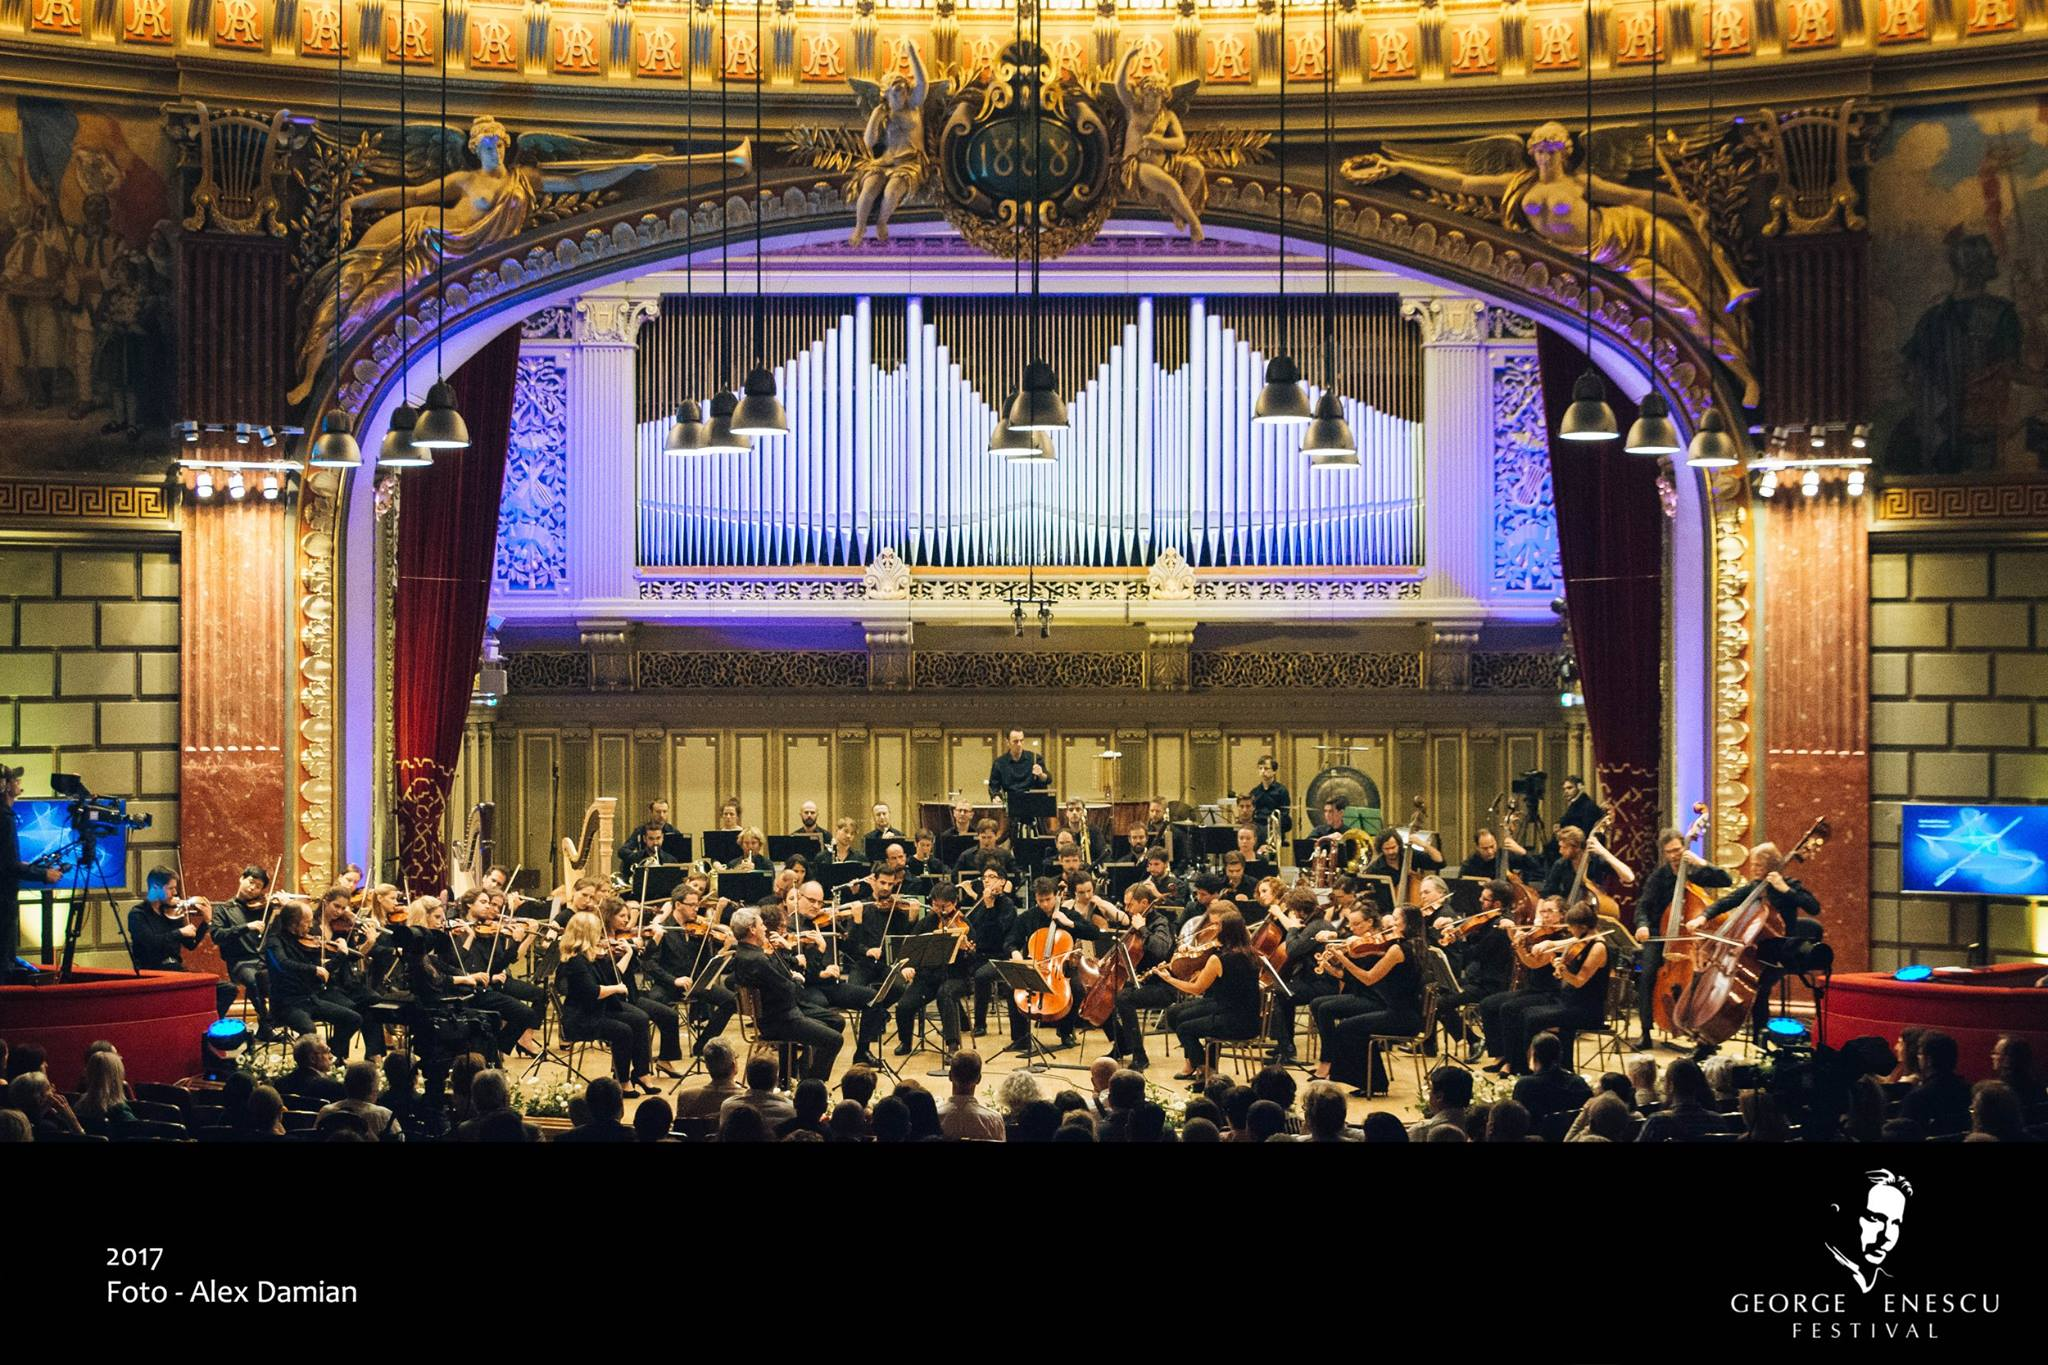 Bucharest's treasure: The International Classical Music Festival George Enescu